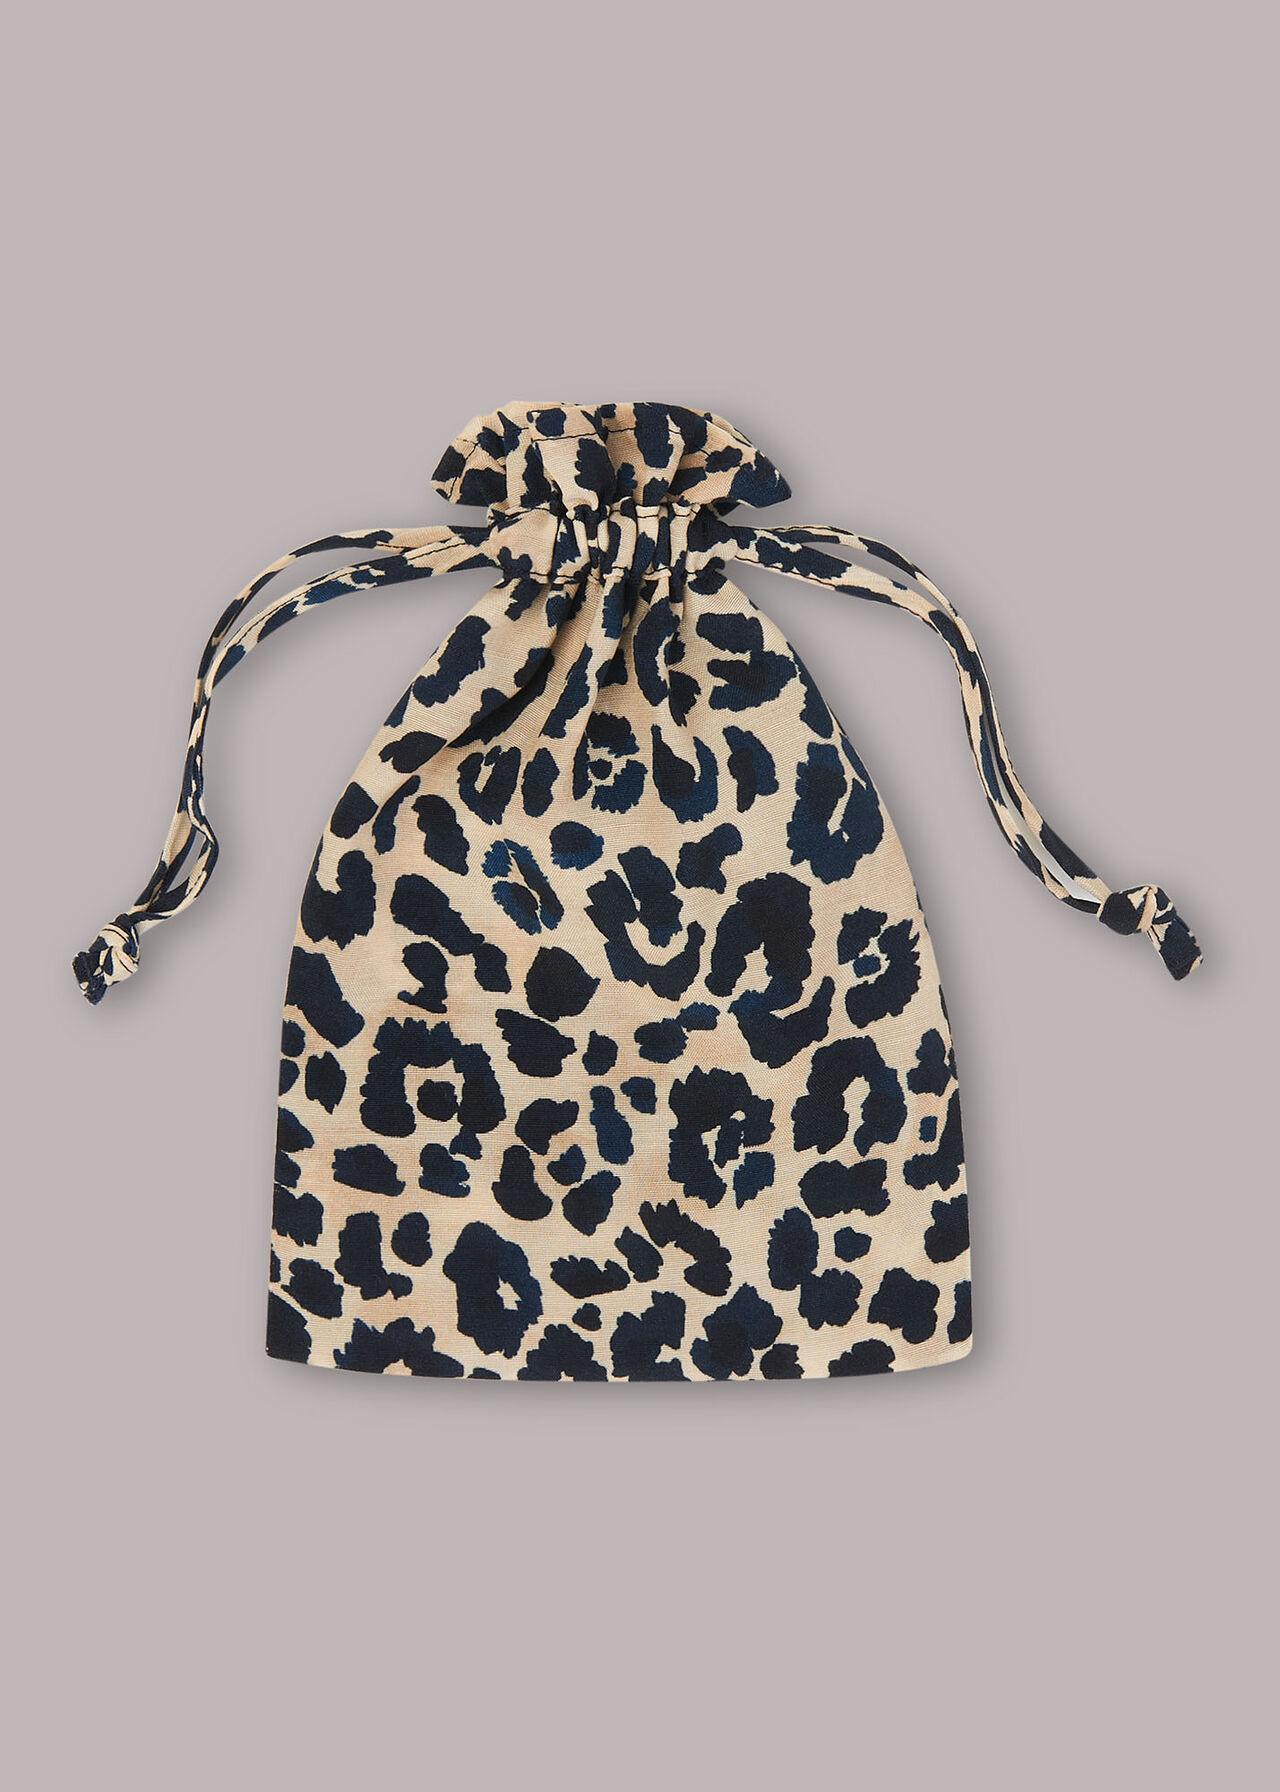 Cheetah Print Face Covering